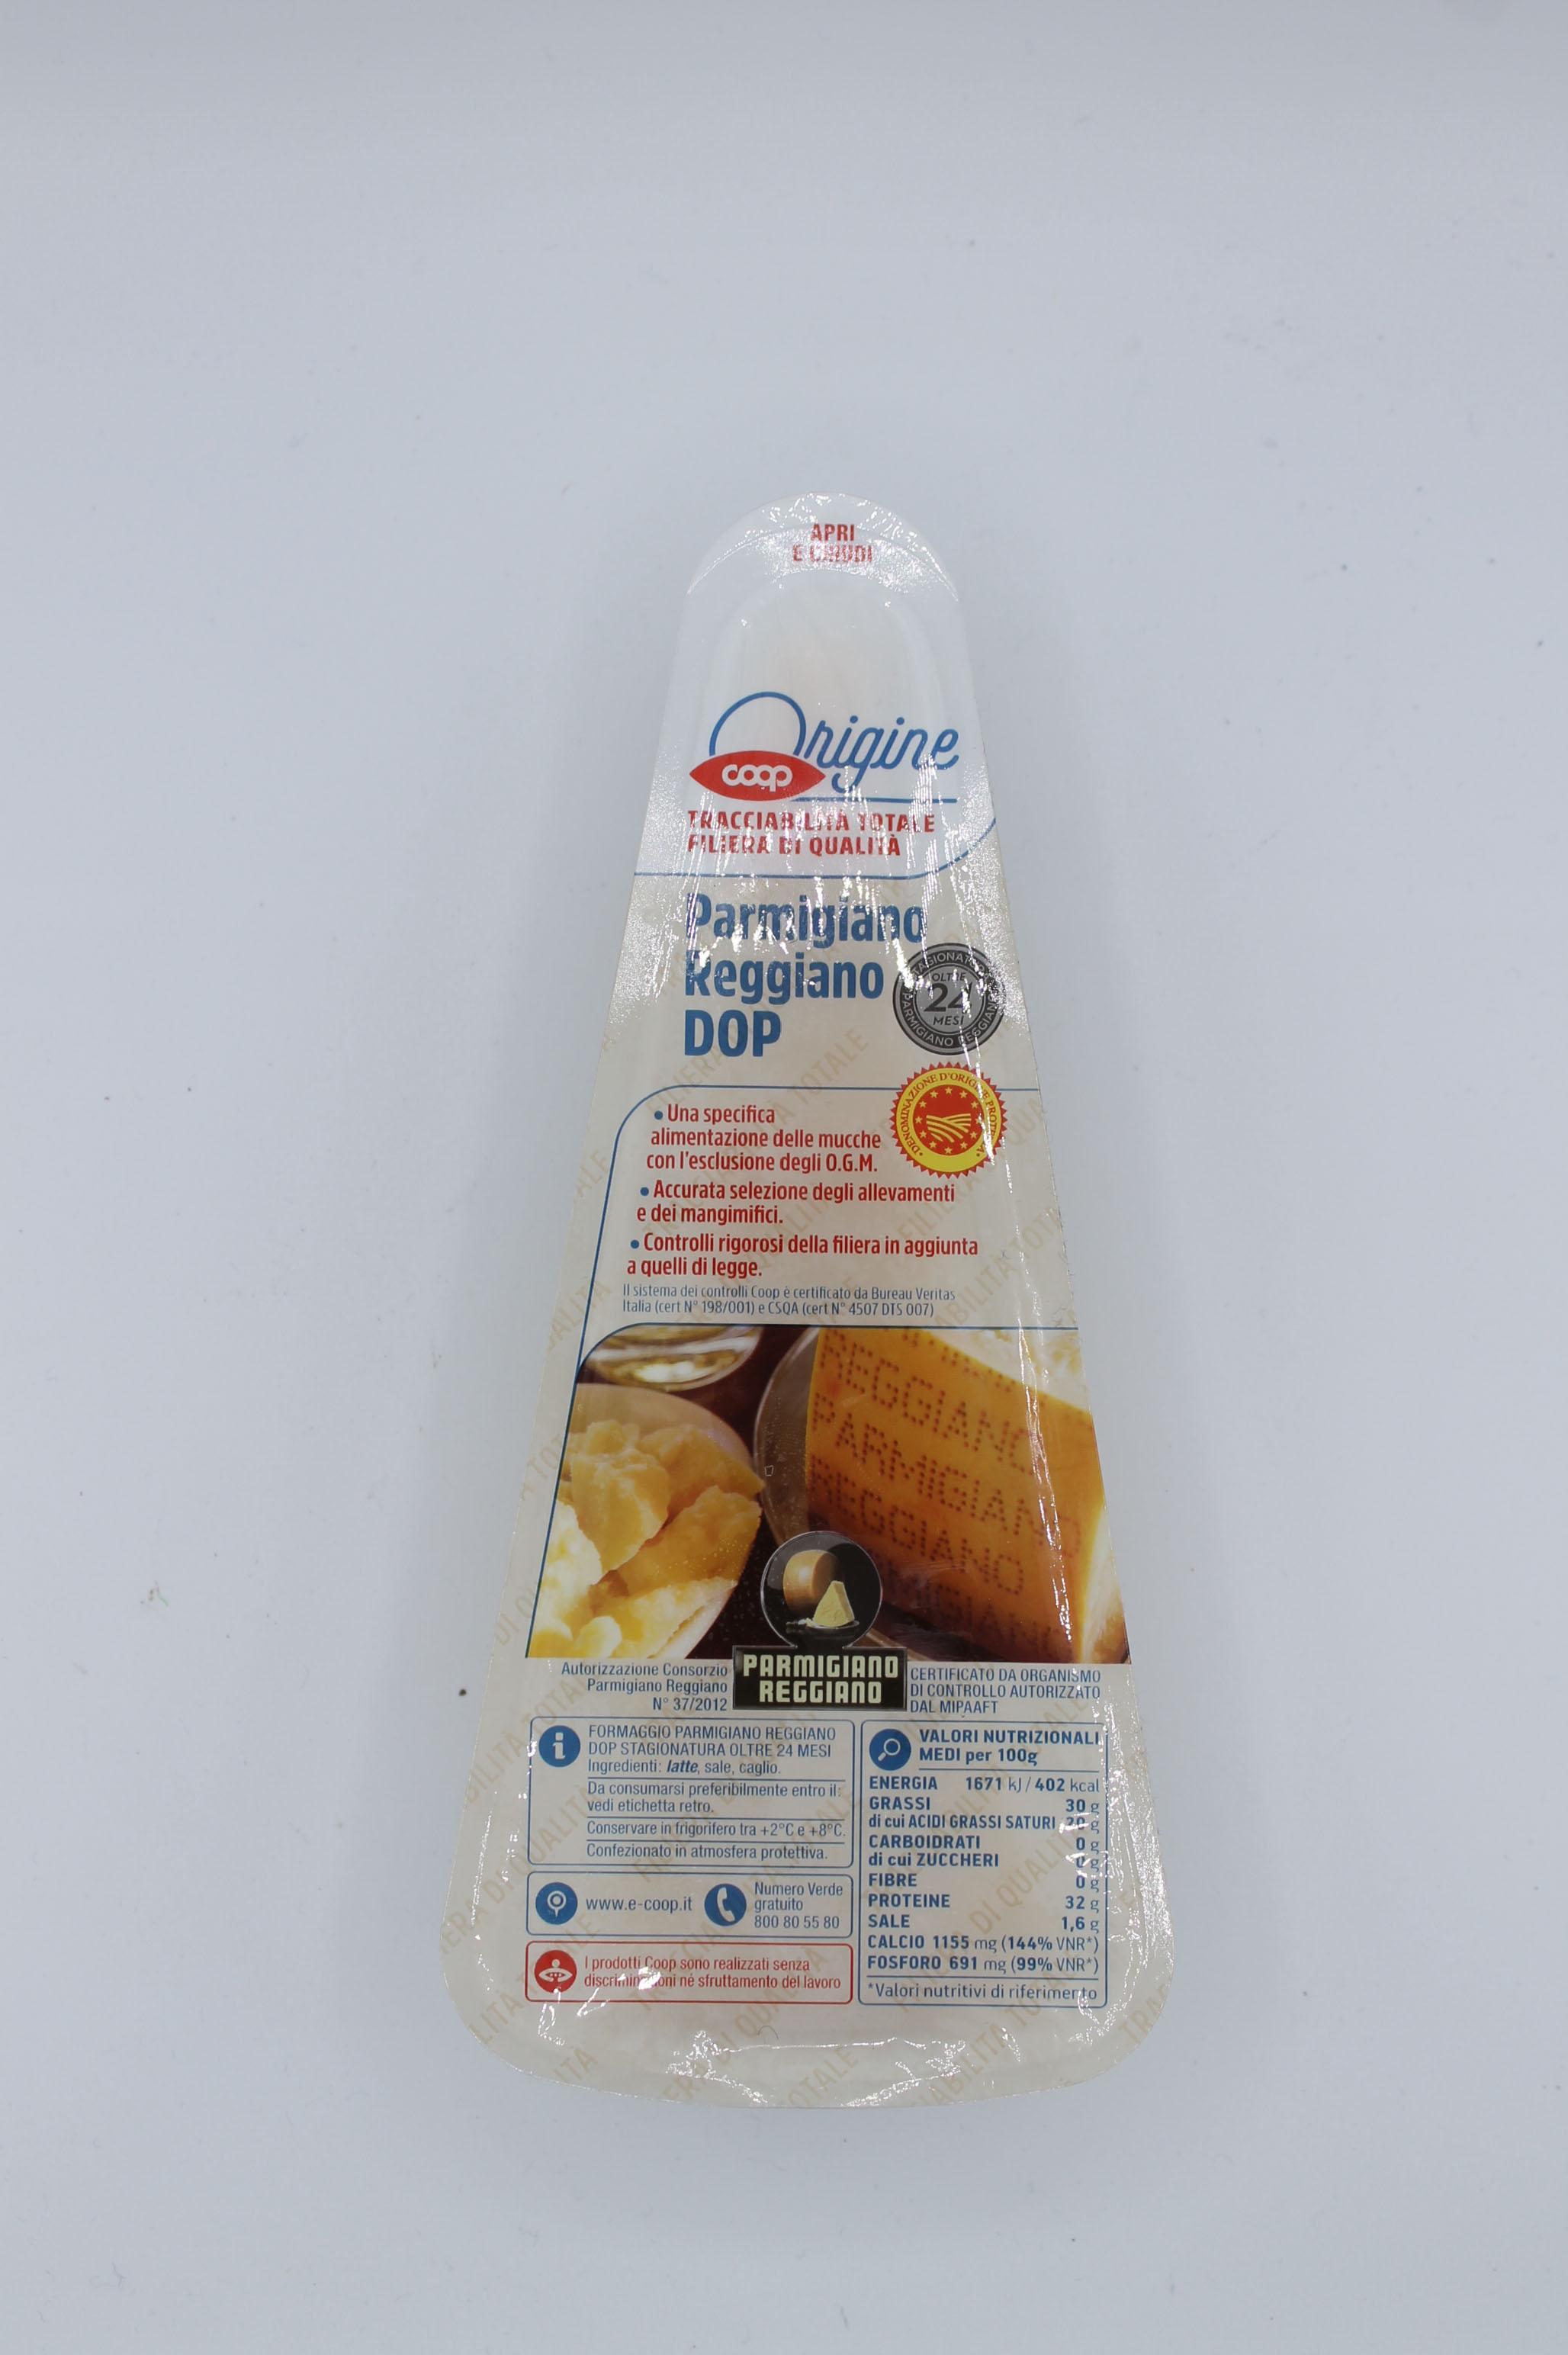 Coop parmigiano reggiano DOP 24 mesi 300gr.